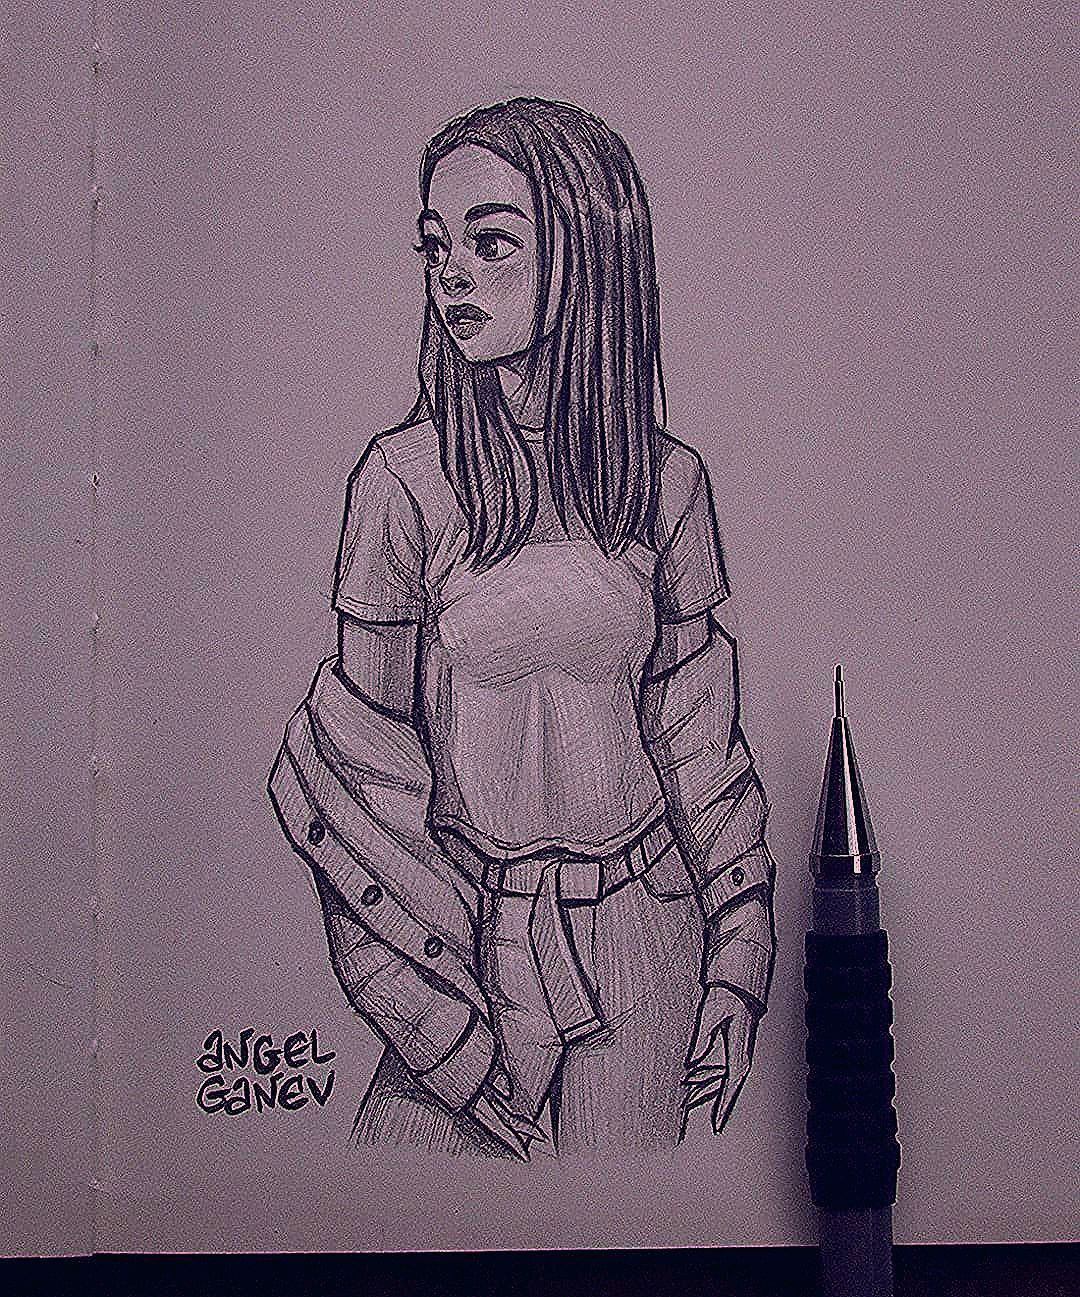 Pin By Raegan On Art Drawings In 2020 Art Drawings Sketches Simple Girly Drawings Art Drawings Sketches Creative